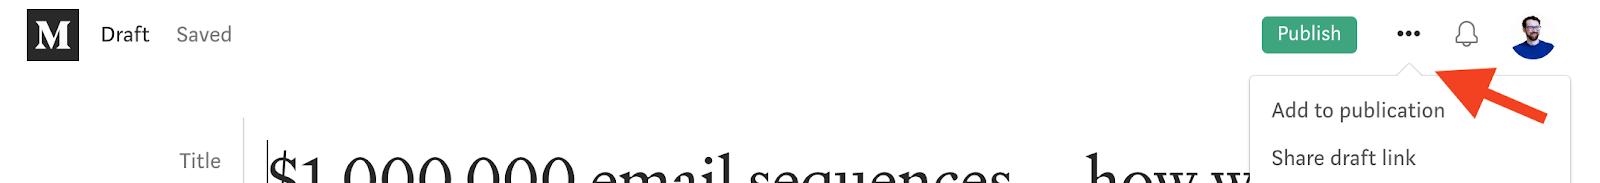 Add portfolio samples to publications on Medium